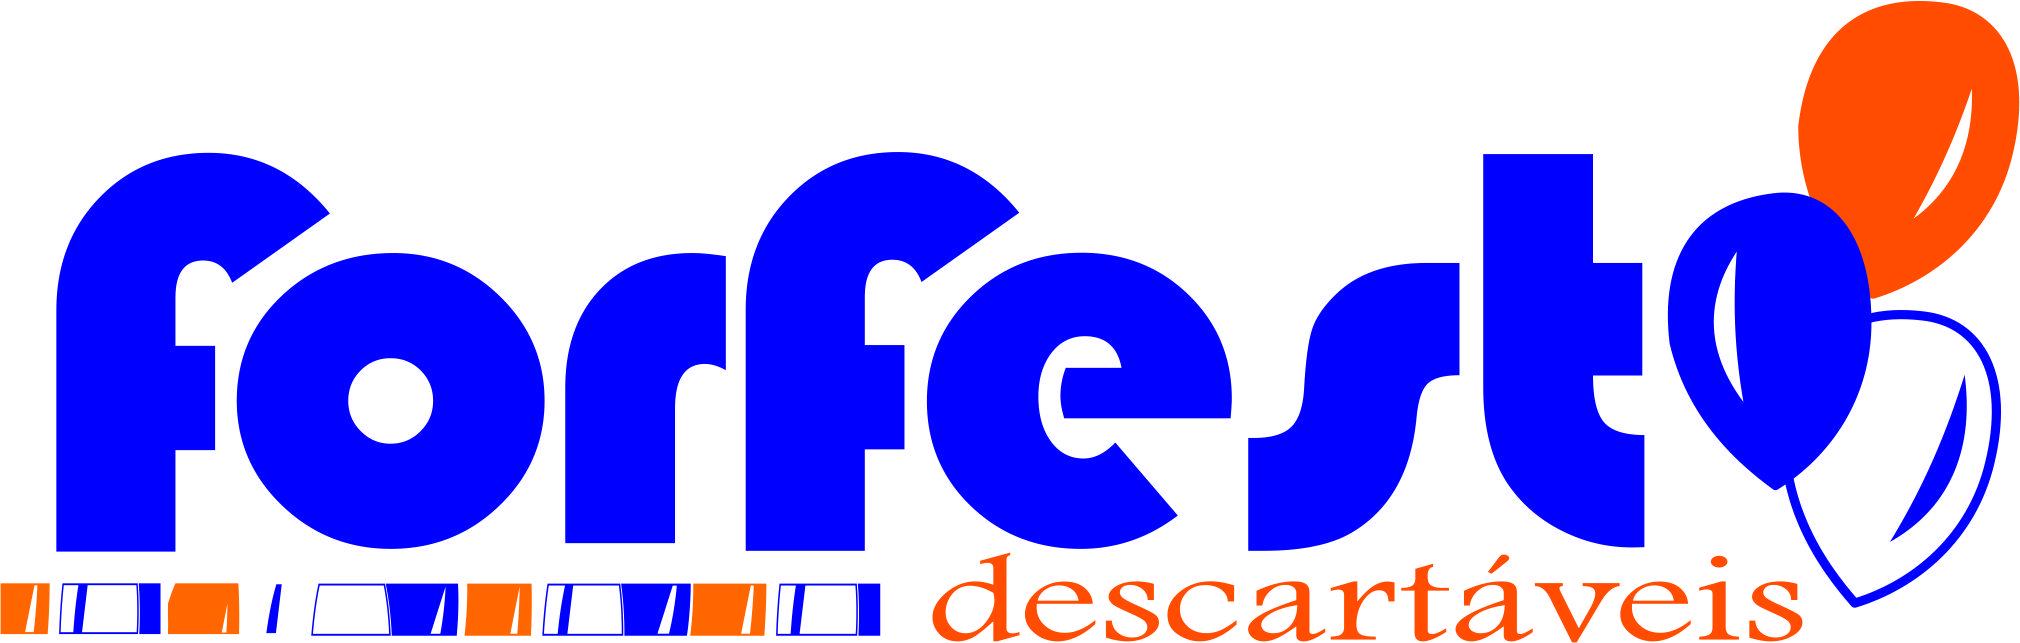 Forfest Descartáveis